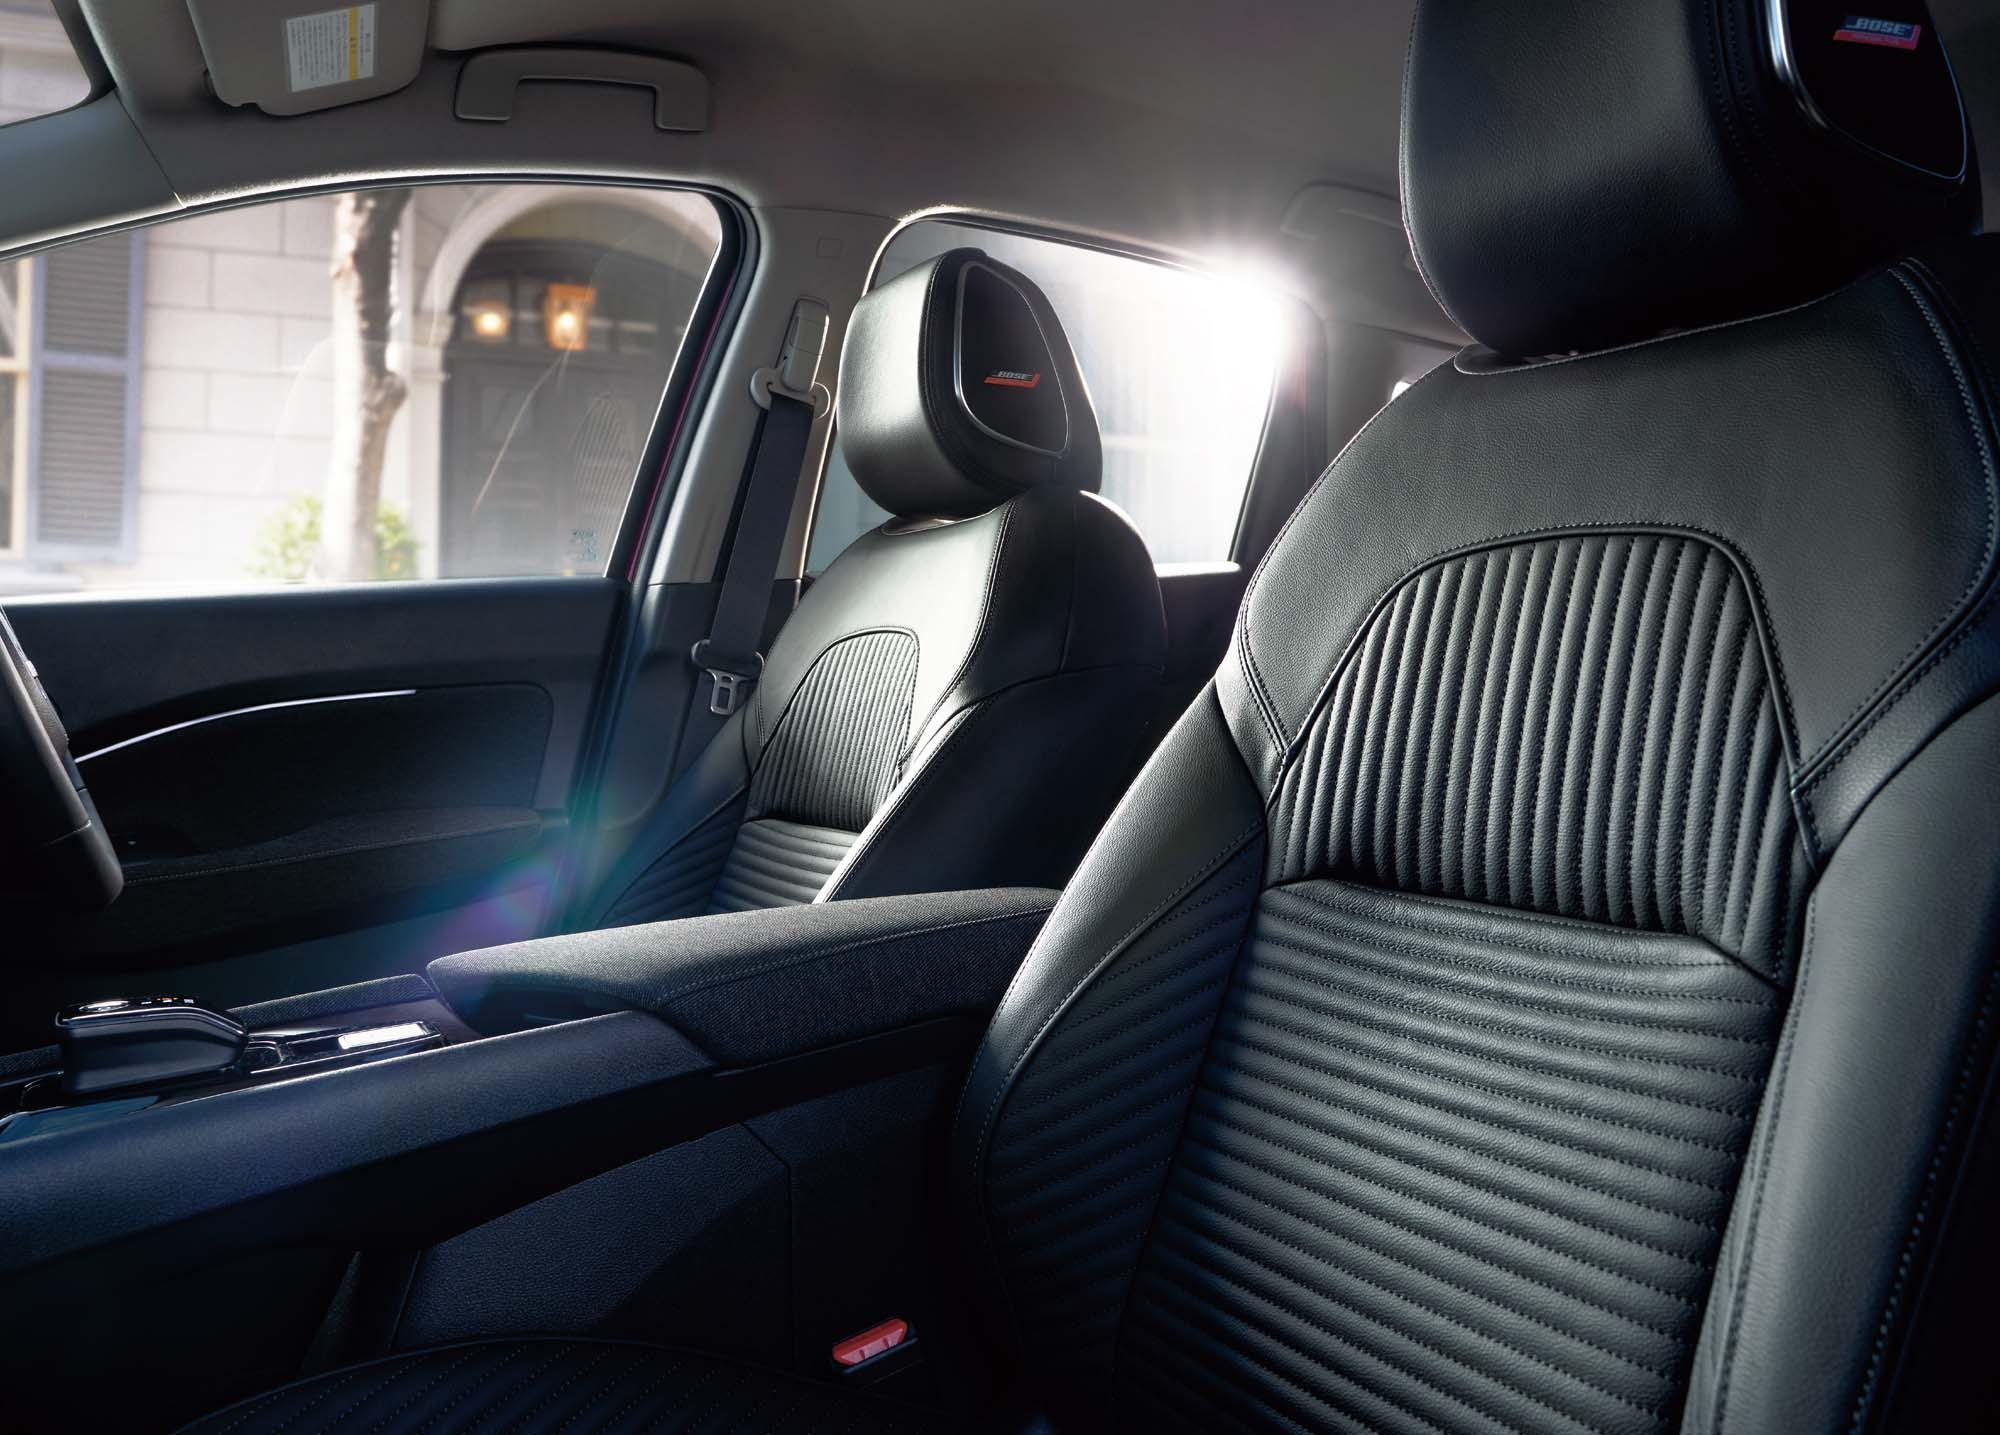 009 NOTE AURA image interior Nissan : λανσάρει το ολοκαίνουριο Note Aura στην Ιαπωνία Electric cars, electric vehicles, Nissan, Nissan Note, Nissan Note Aura, Note, Note Aura, ειδήσεις, ηλεκτρικά, ηλεκτροκινηση, Νέα